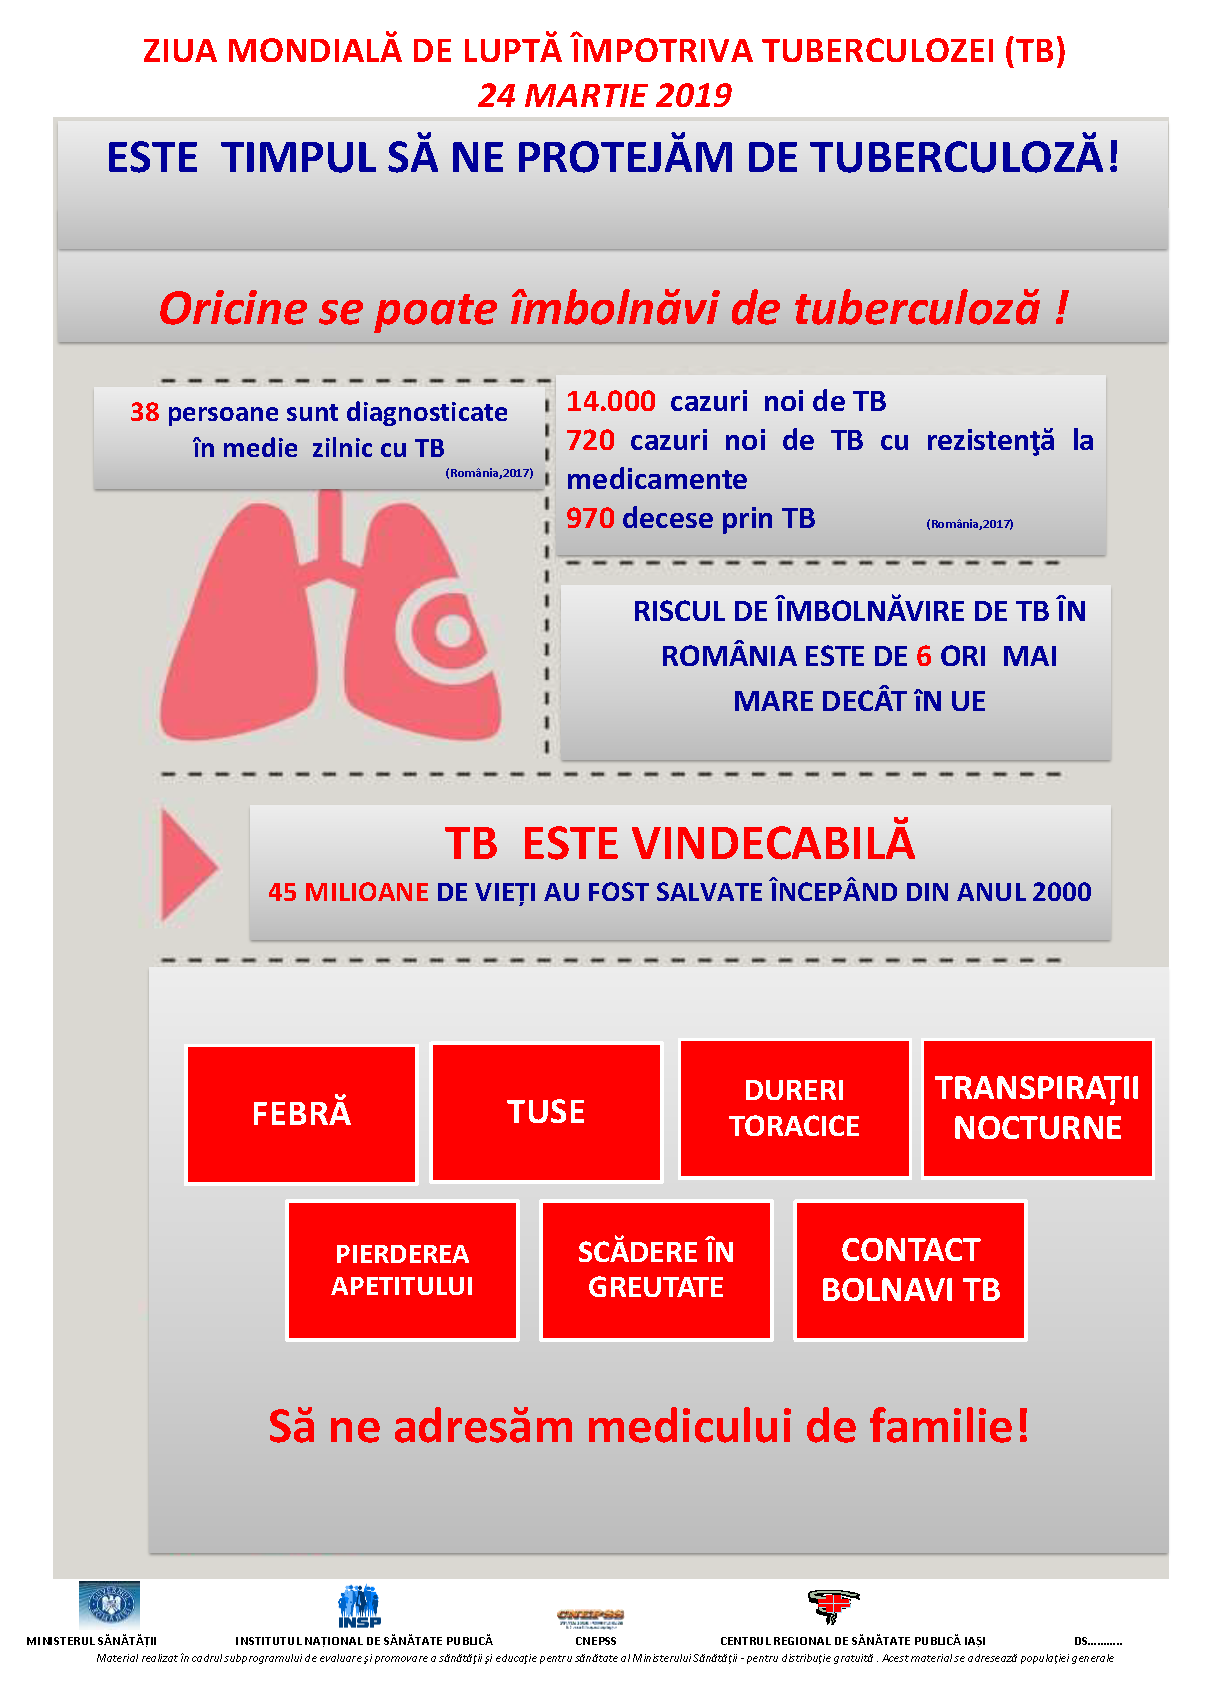 Informatii utile despre Coronavirus